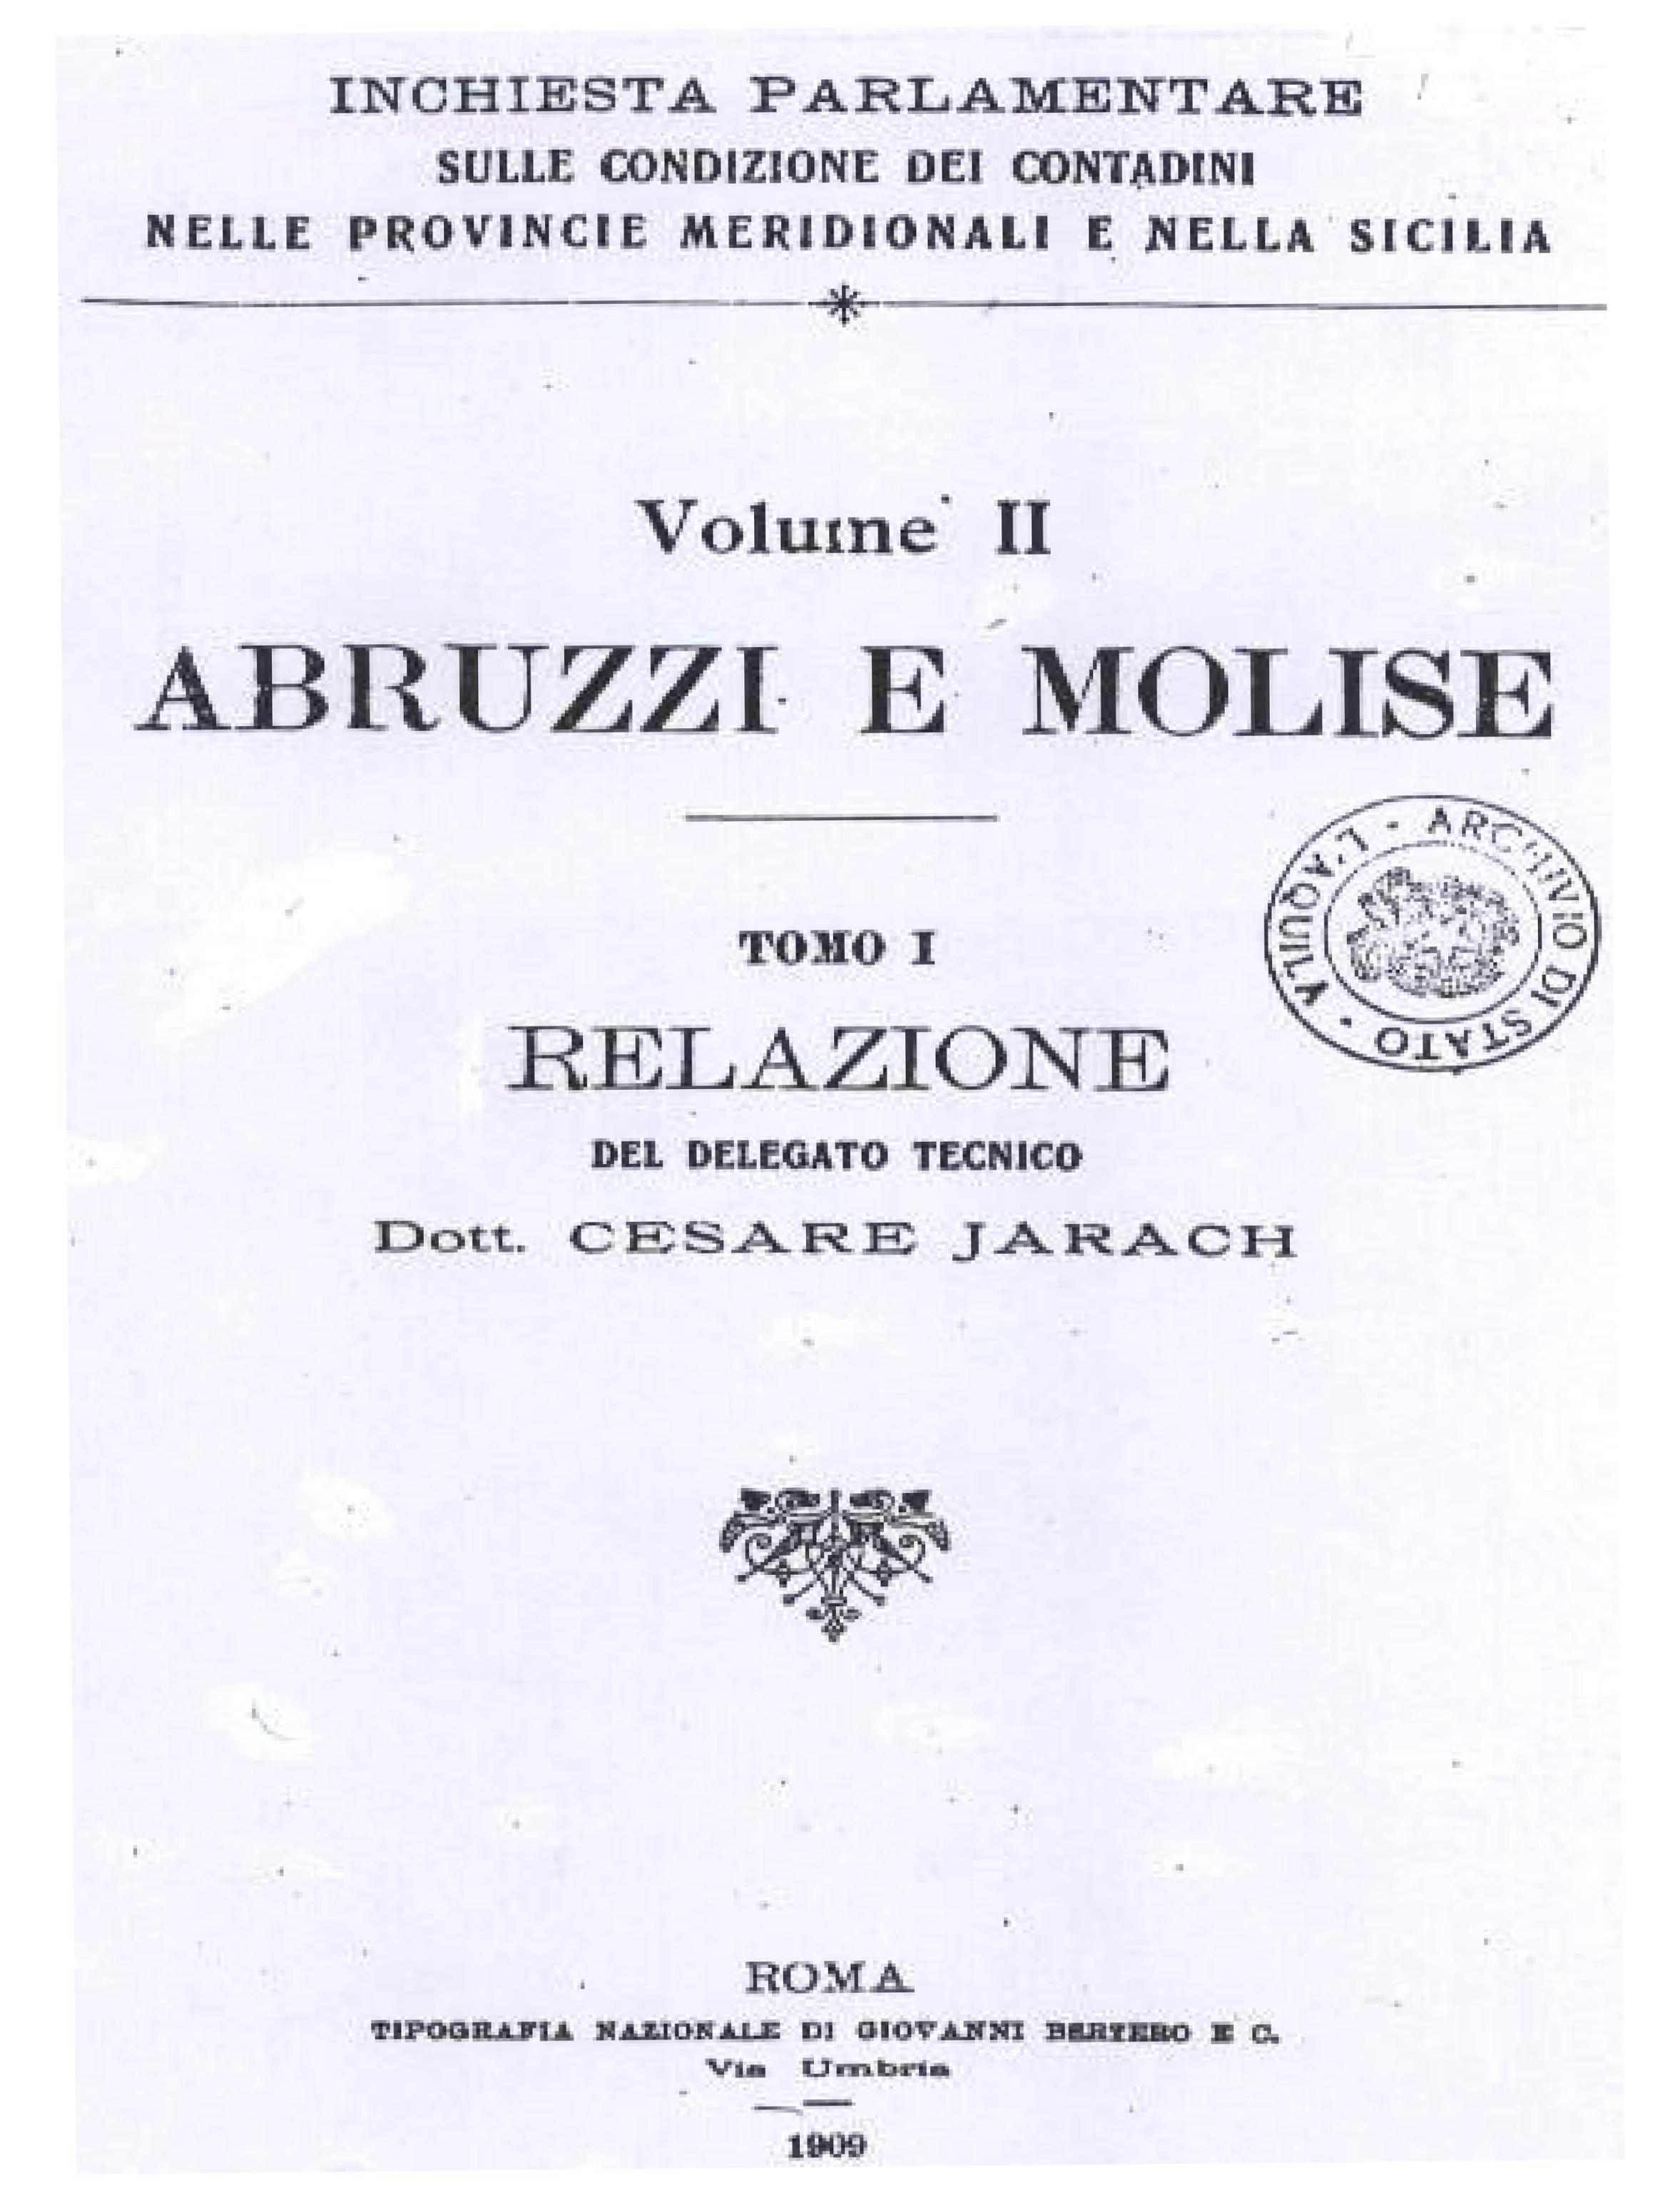 nota storica 1909-1